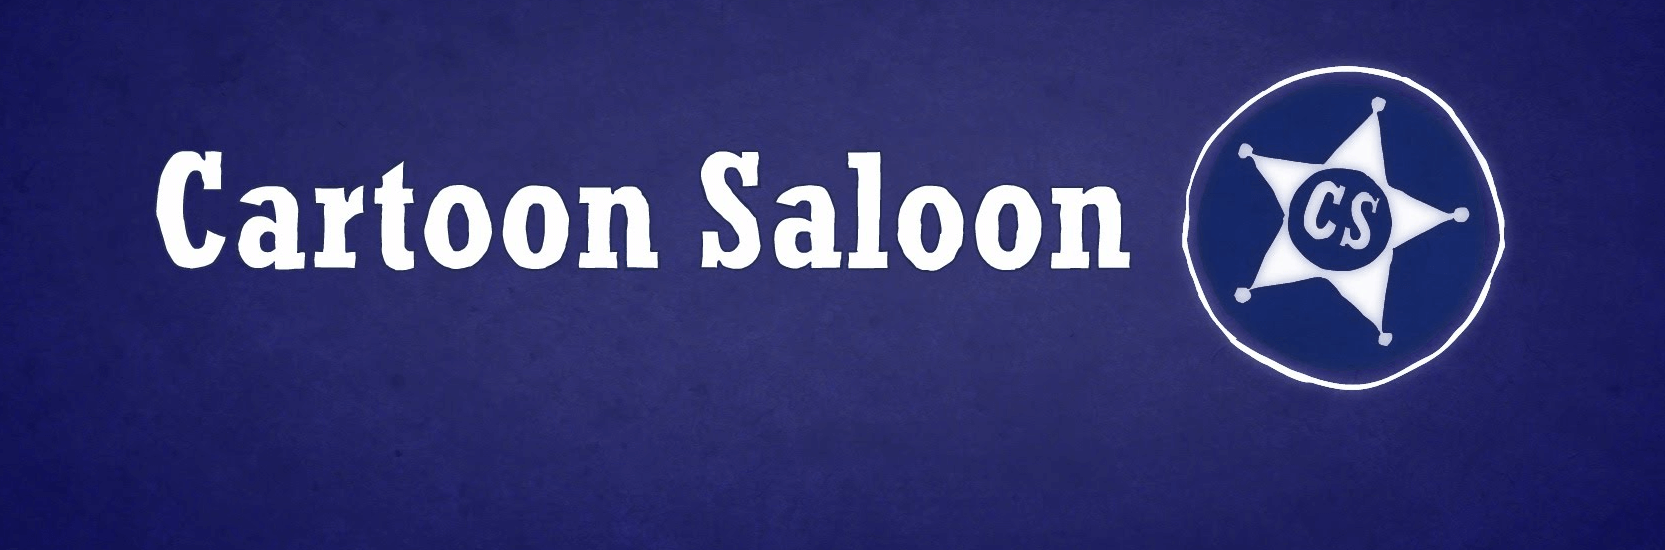 Quoi de neuf chez Cartoon Saloon ?